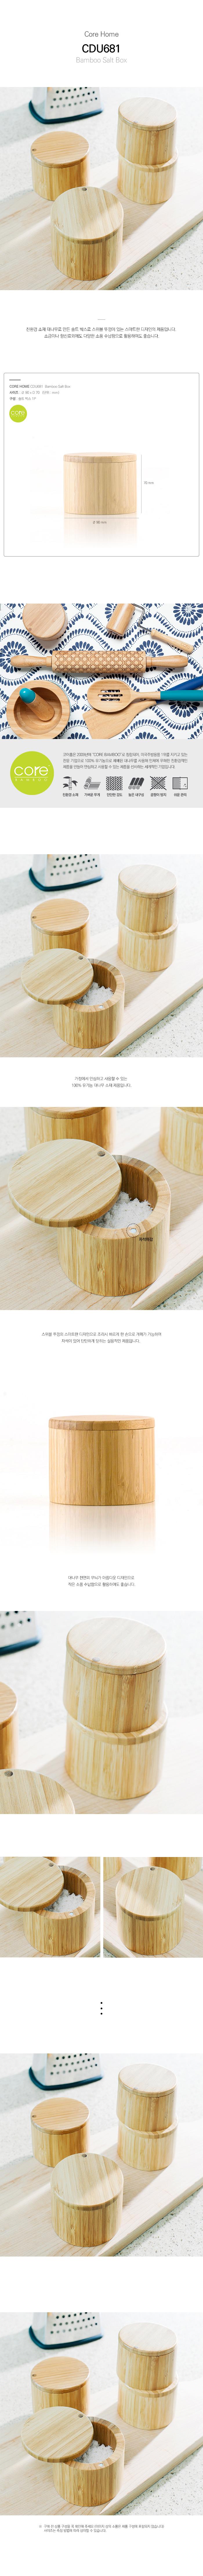 CDU681-Bamboo_Salt_Box.jpg